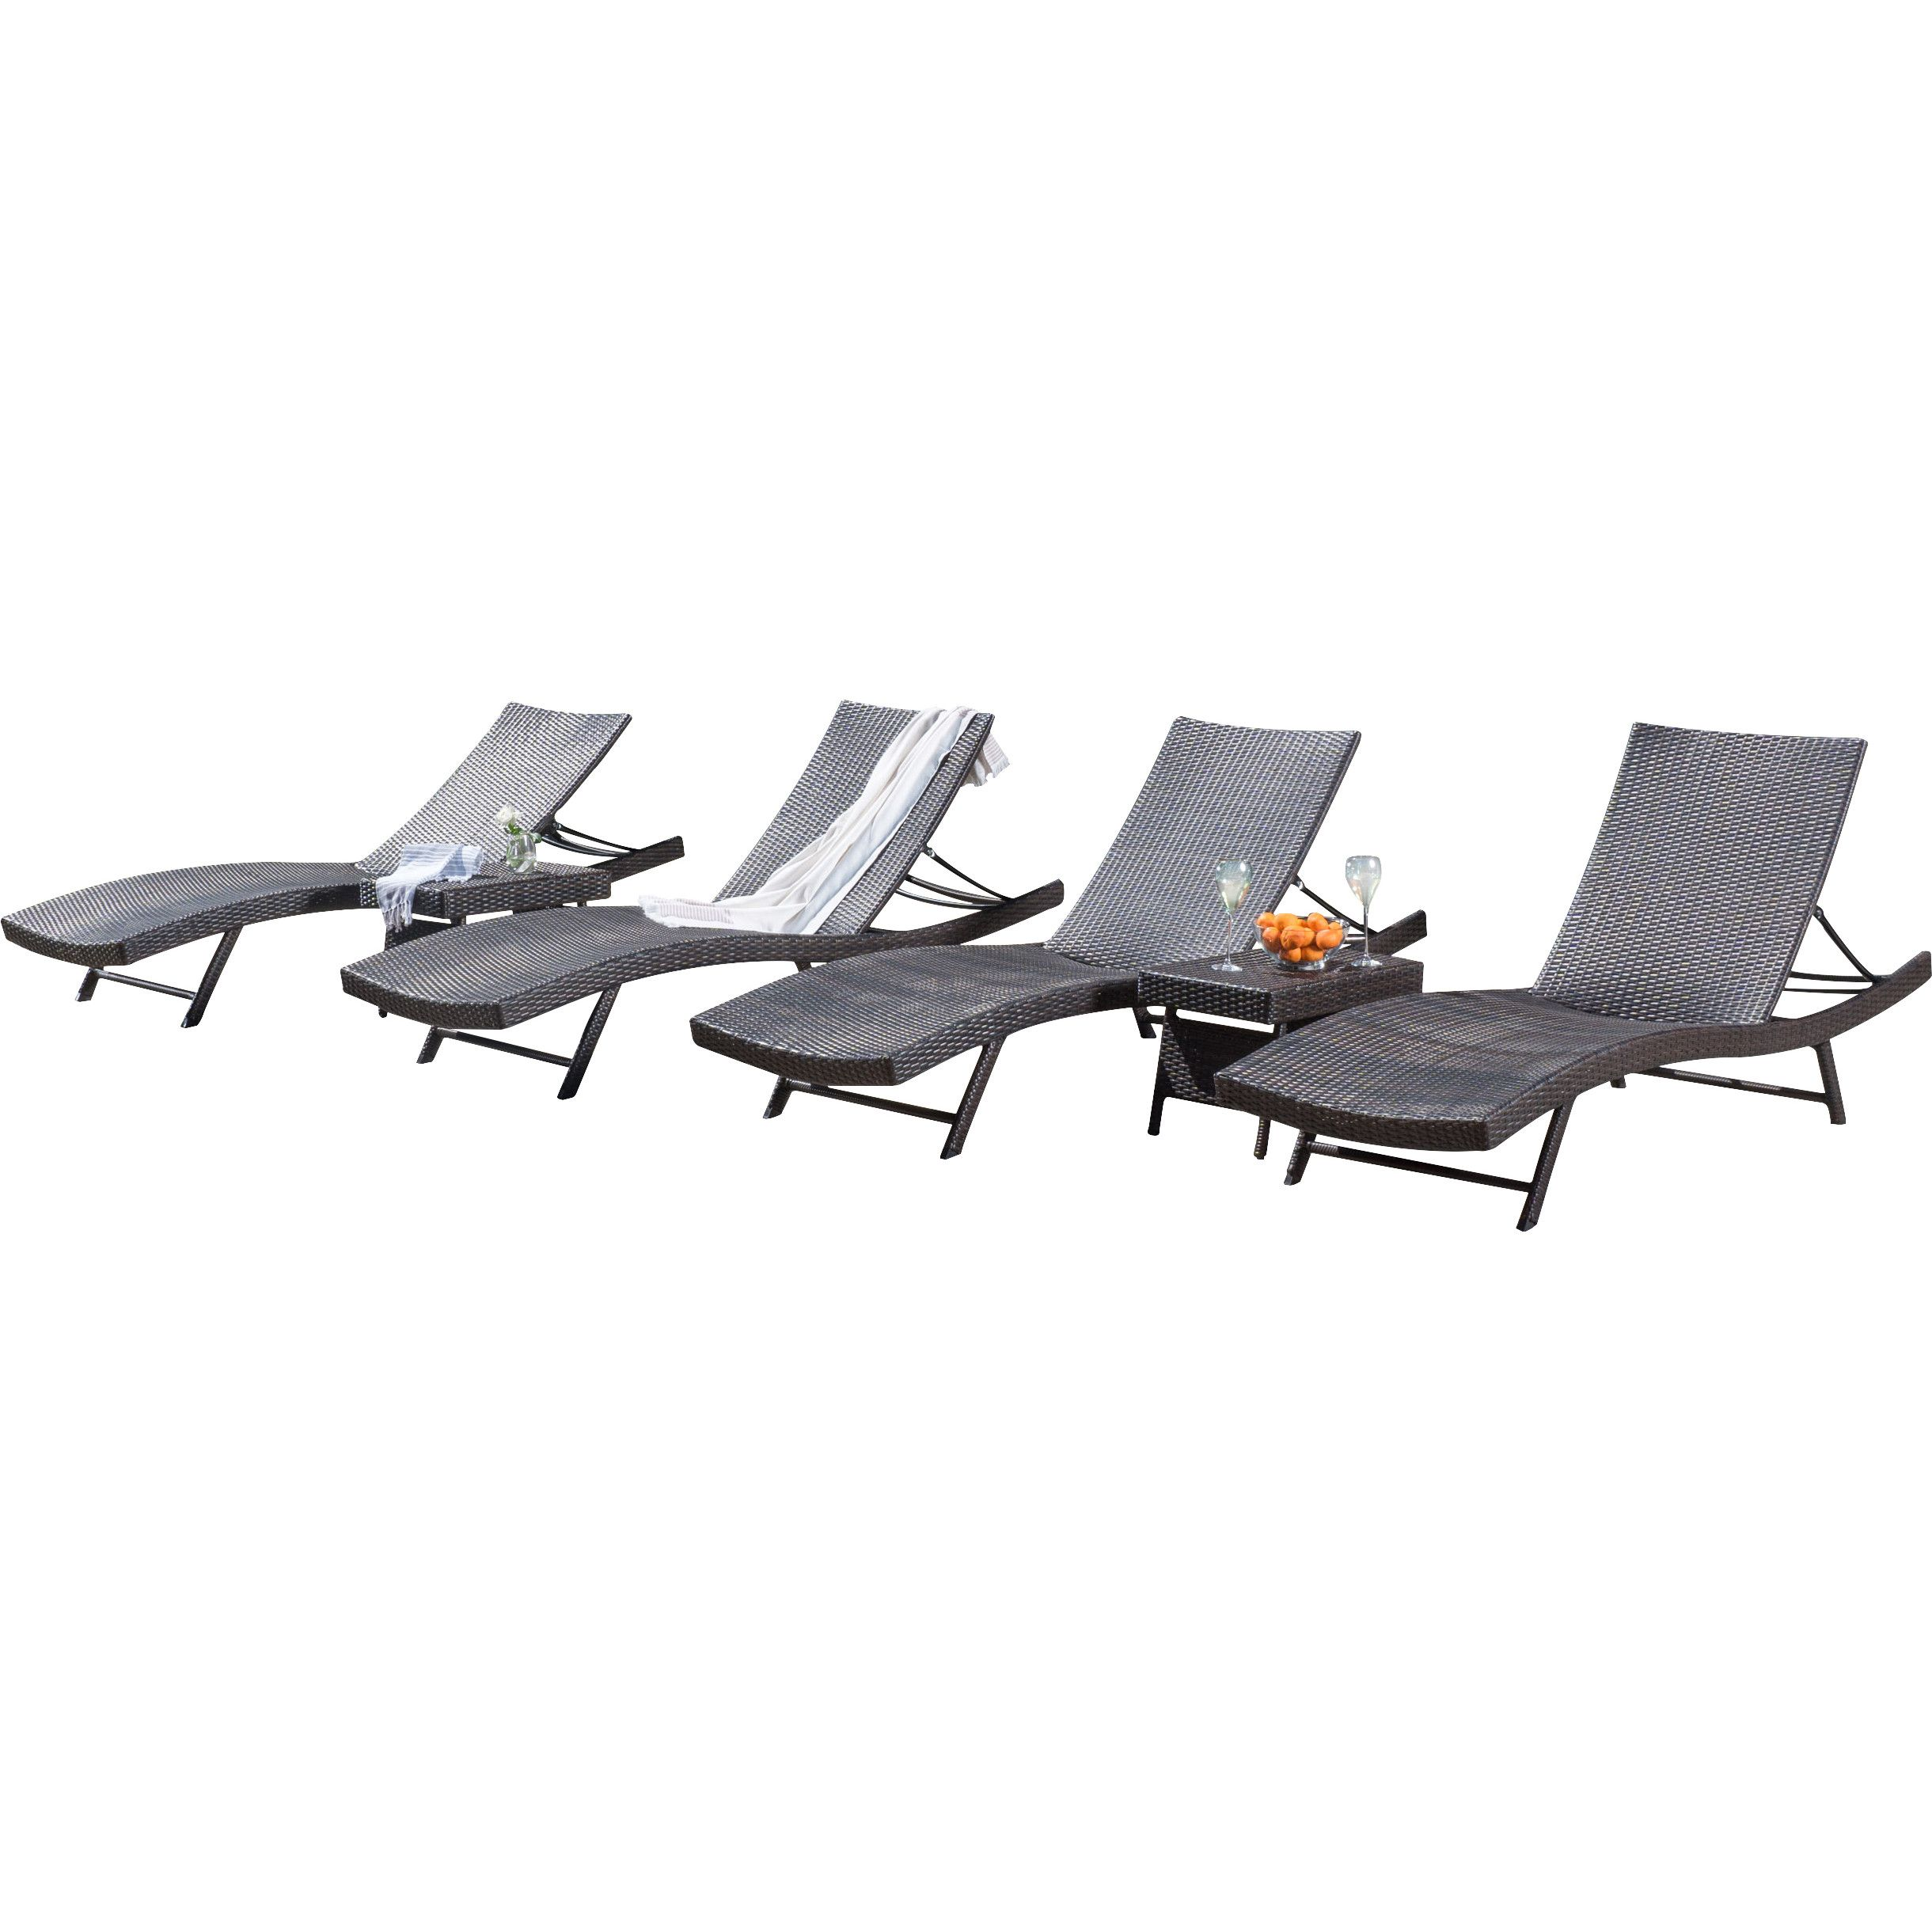 Home Loft Concepts Kauai 6 Piece Wicker Chaise Lounger Set ...